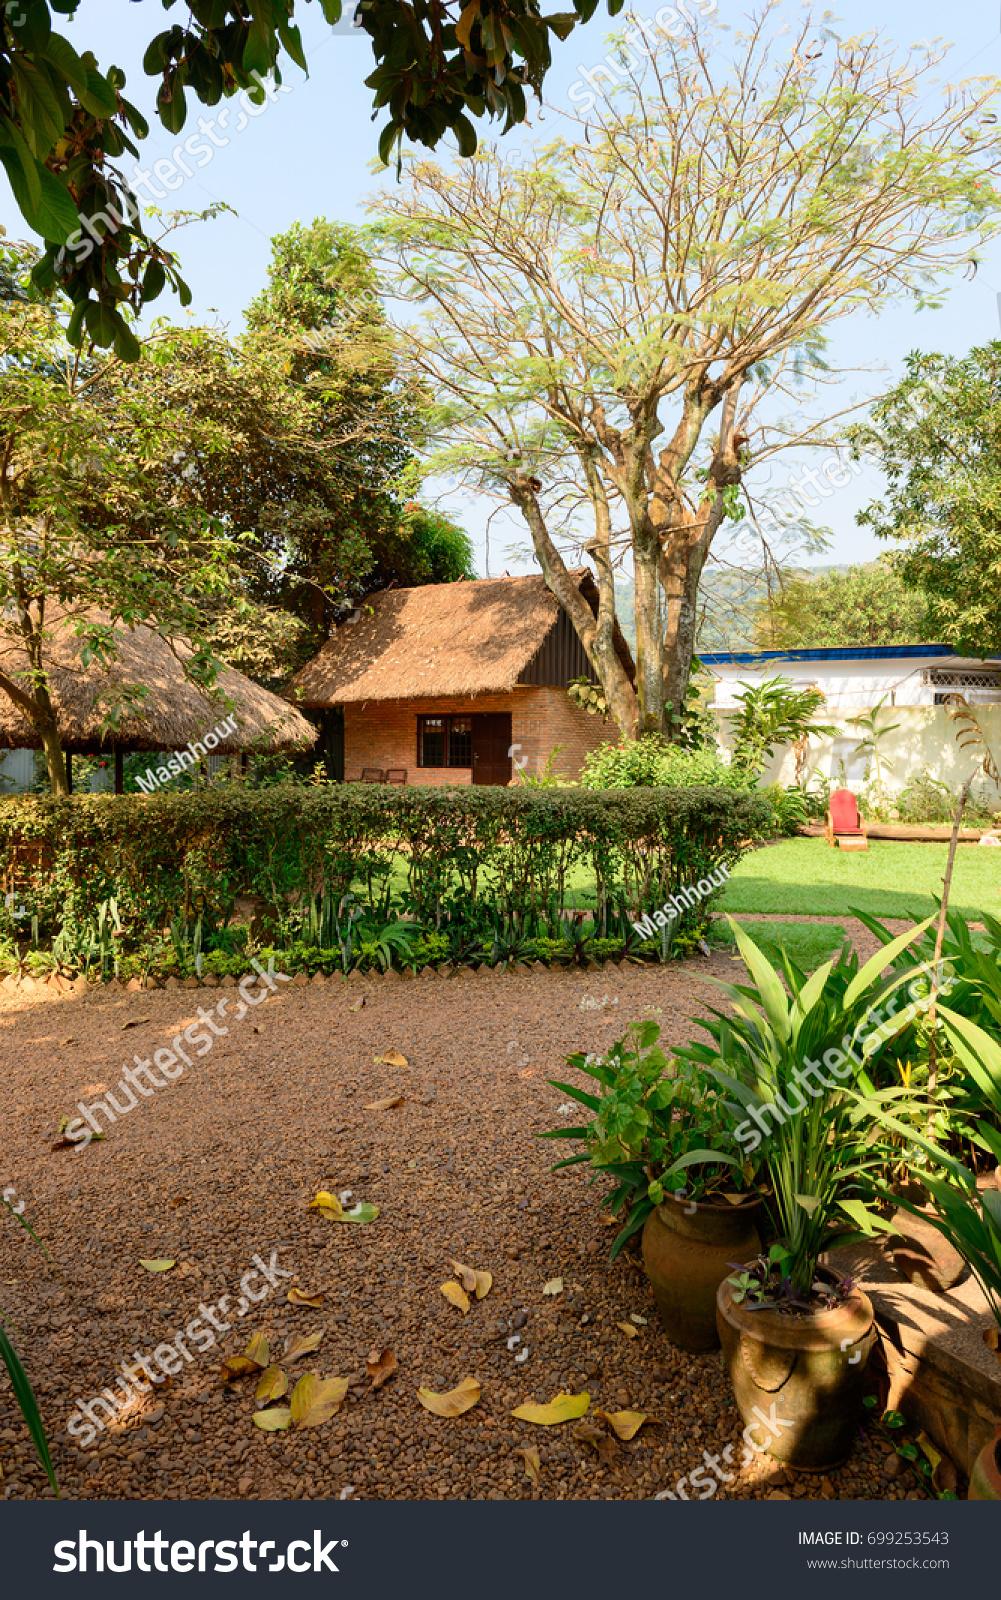 Typical Small House Garden Bangui Center Stock Photo (Royalty Free ...